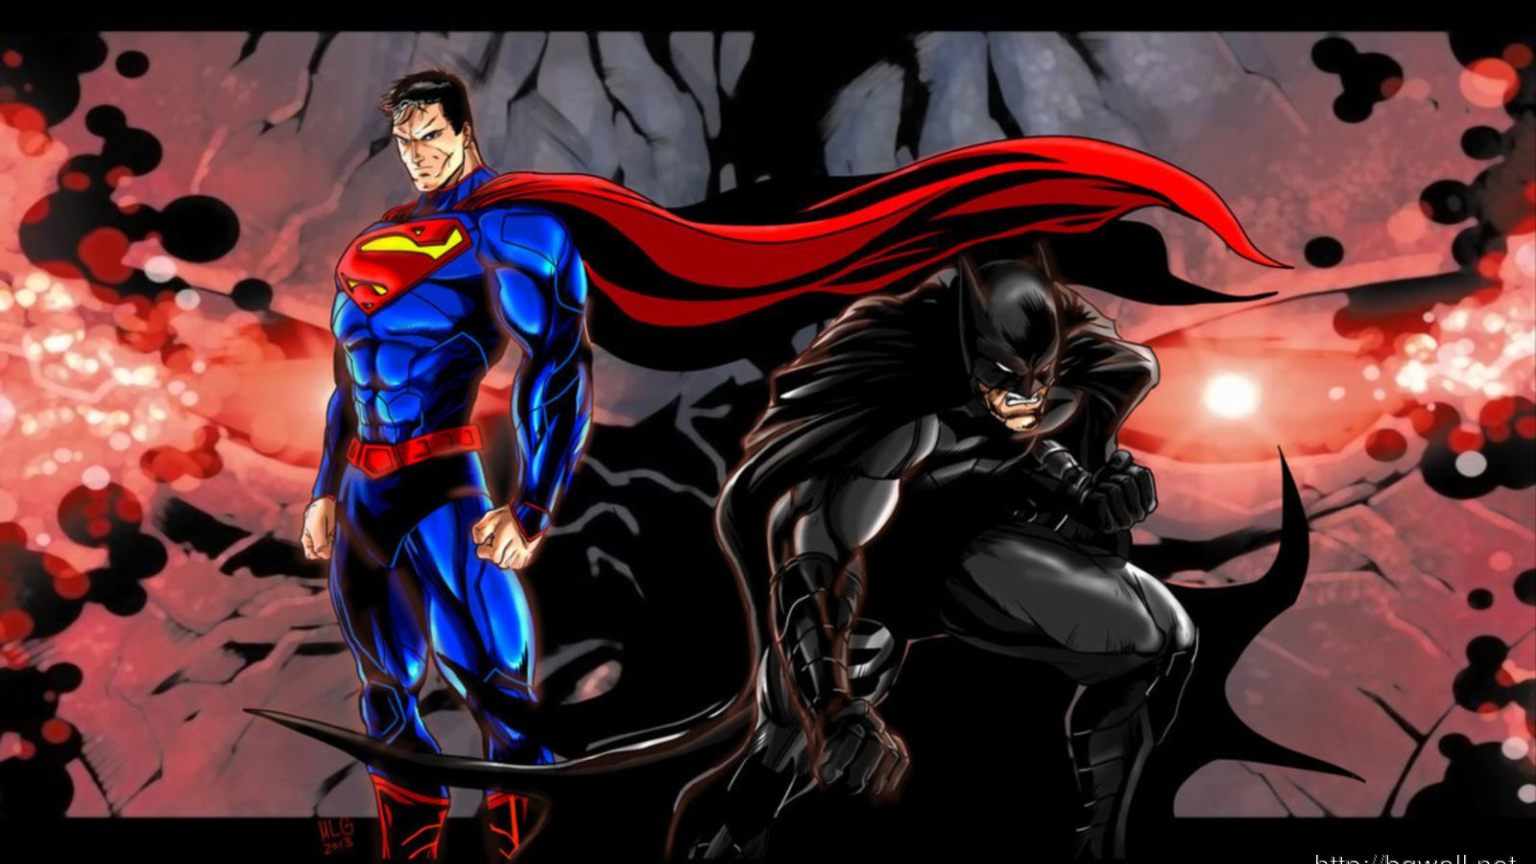 Free Download Bird Phone Wallpaper Batman Vs Superman Android